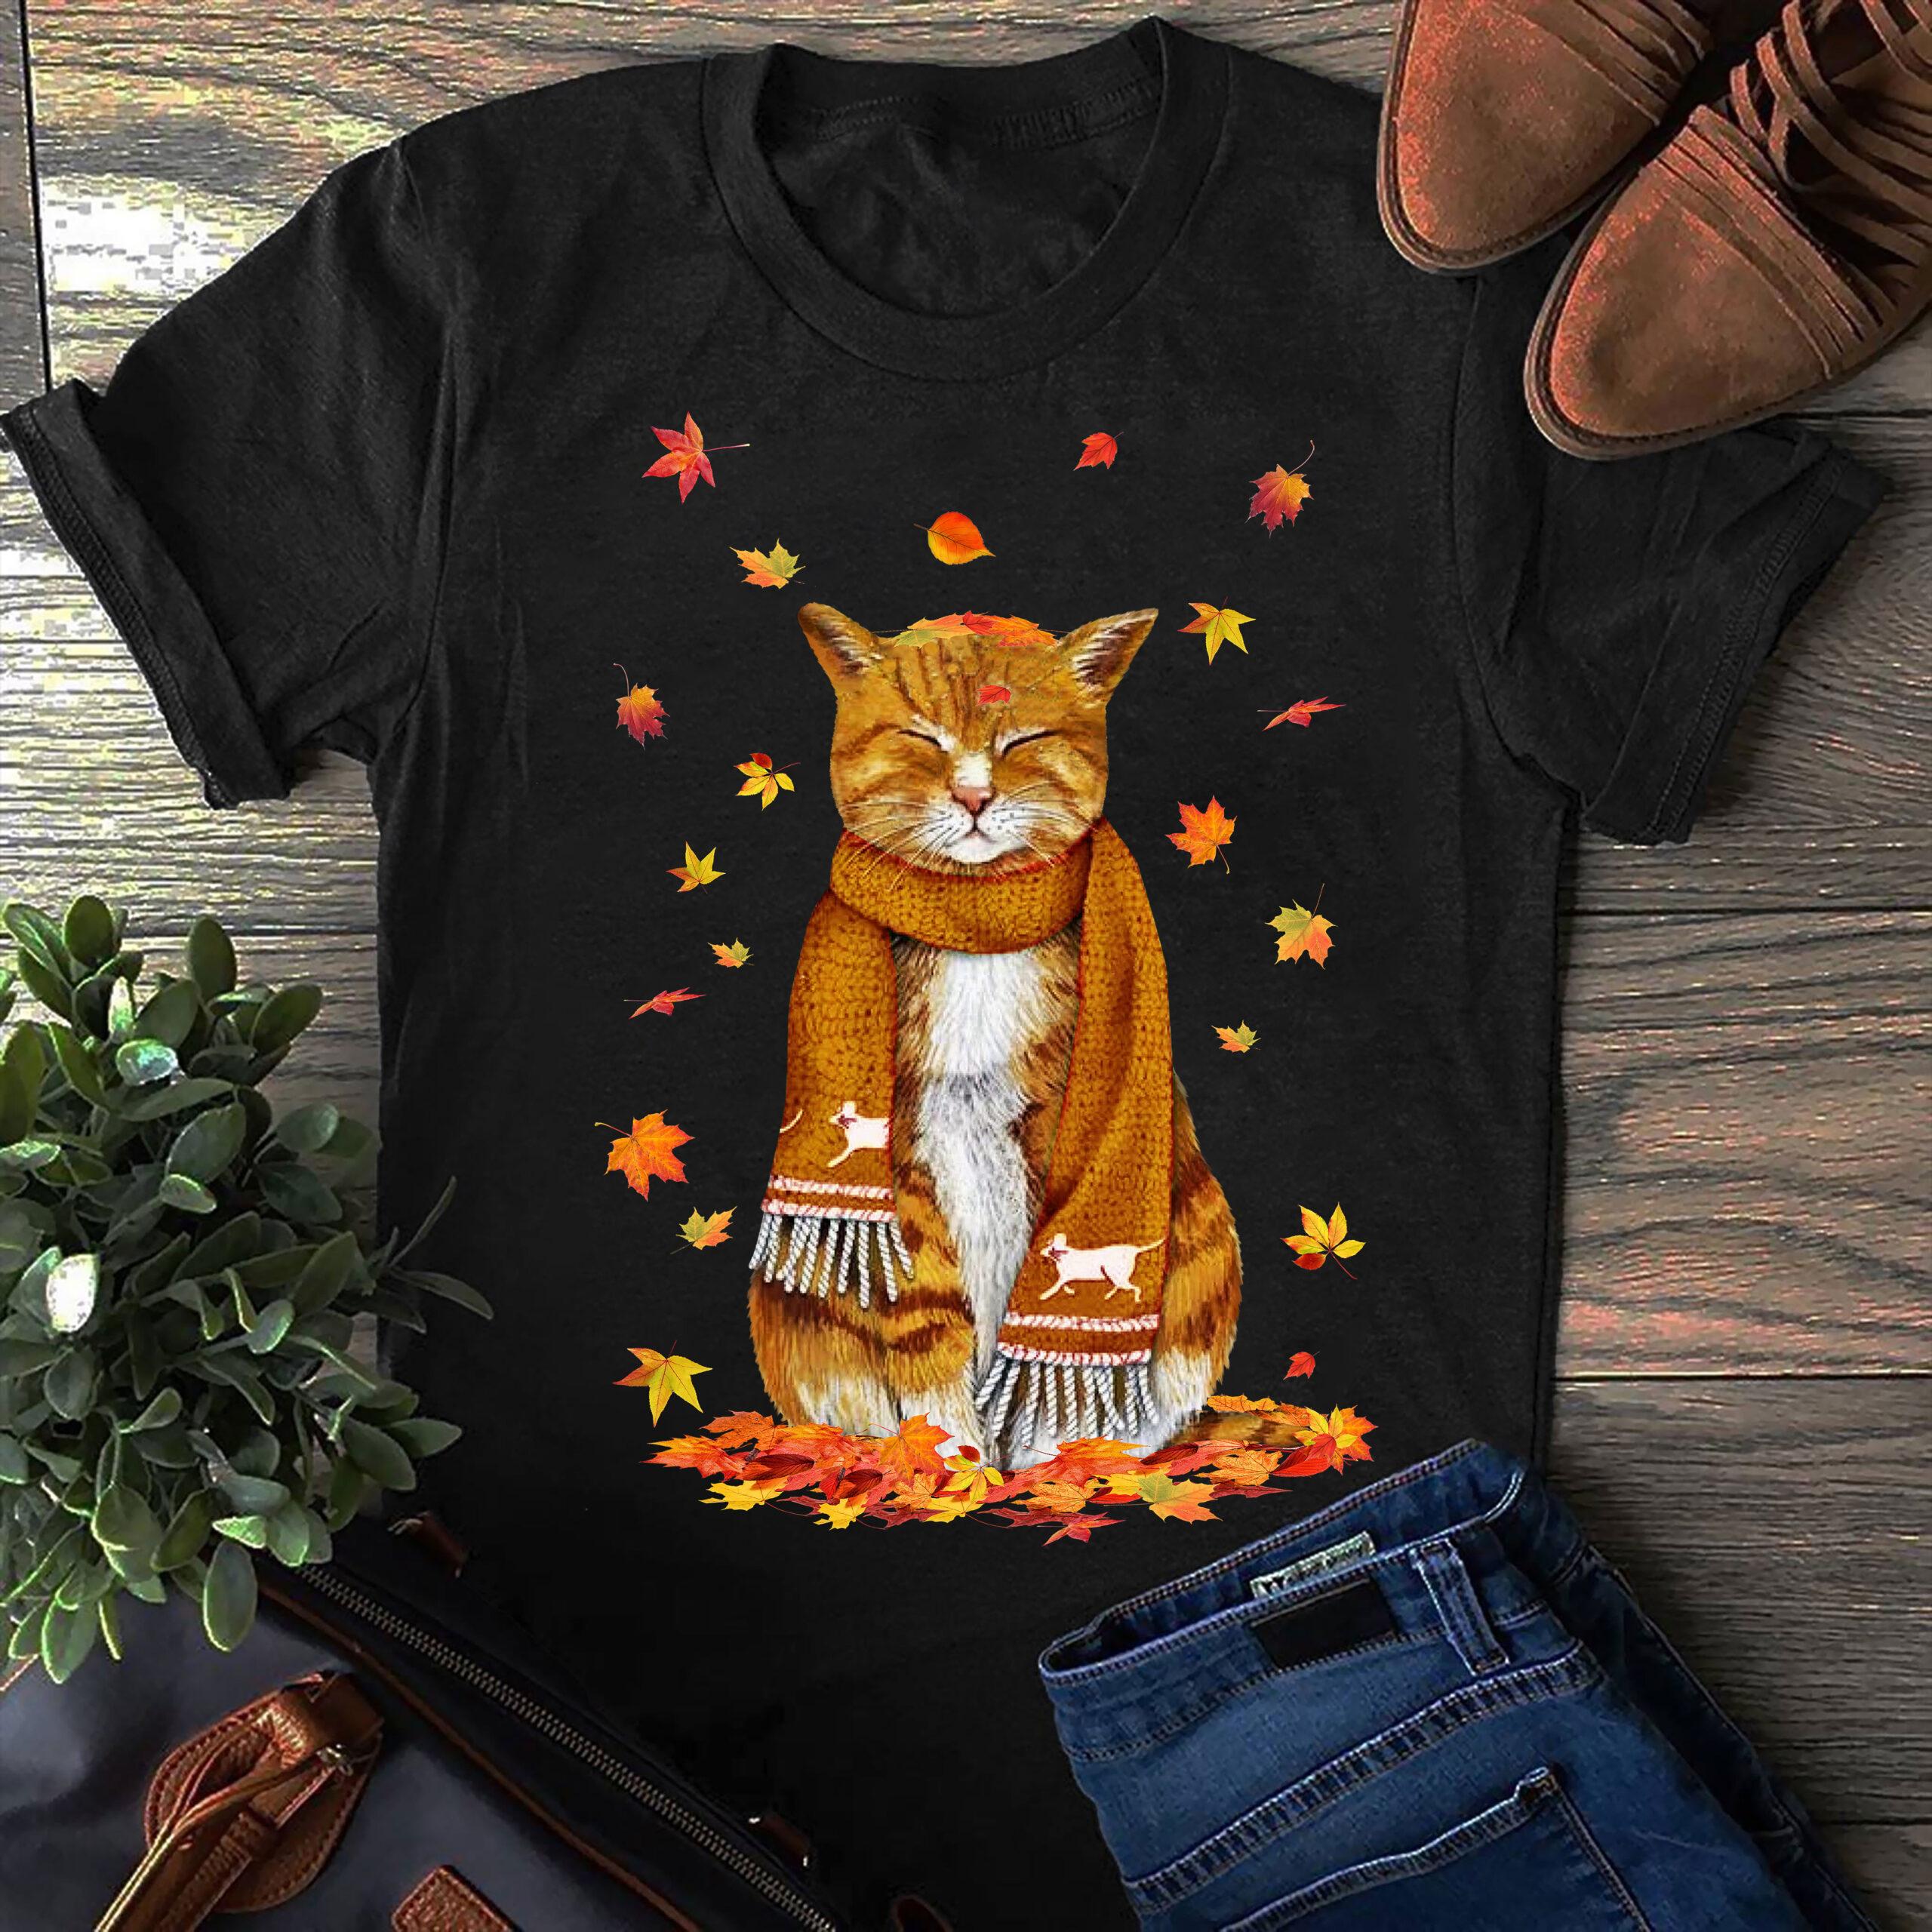 Cat Shirt Autumn Cat Wearing Scarf